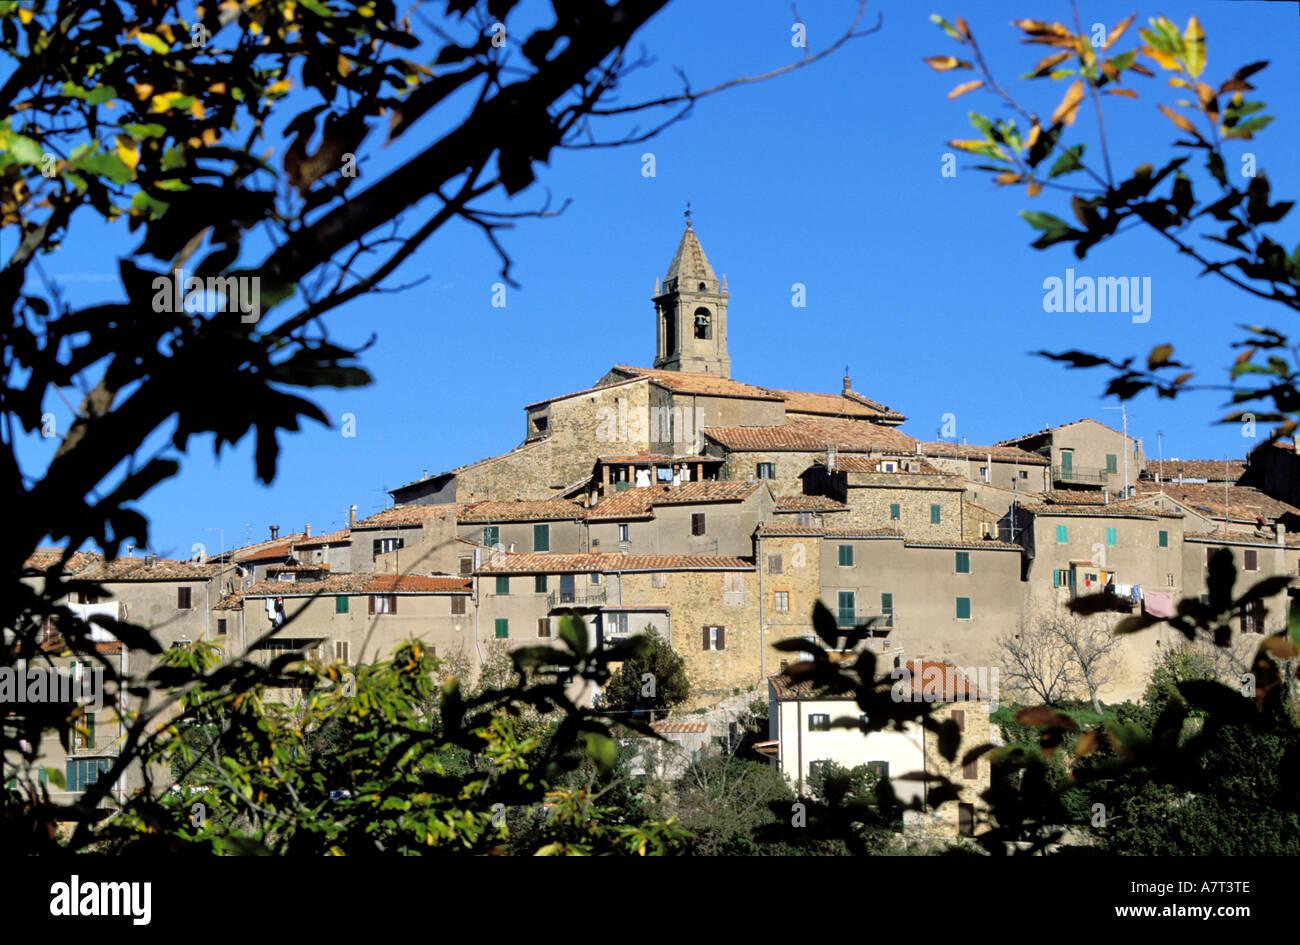 Italy, Tuscany, the village of Monticello Amiata close to Amiata Mount Stock Photo